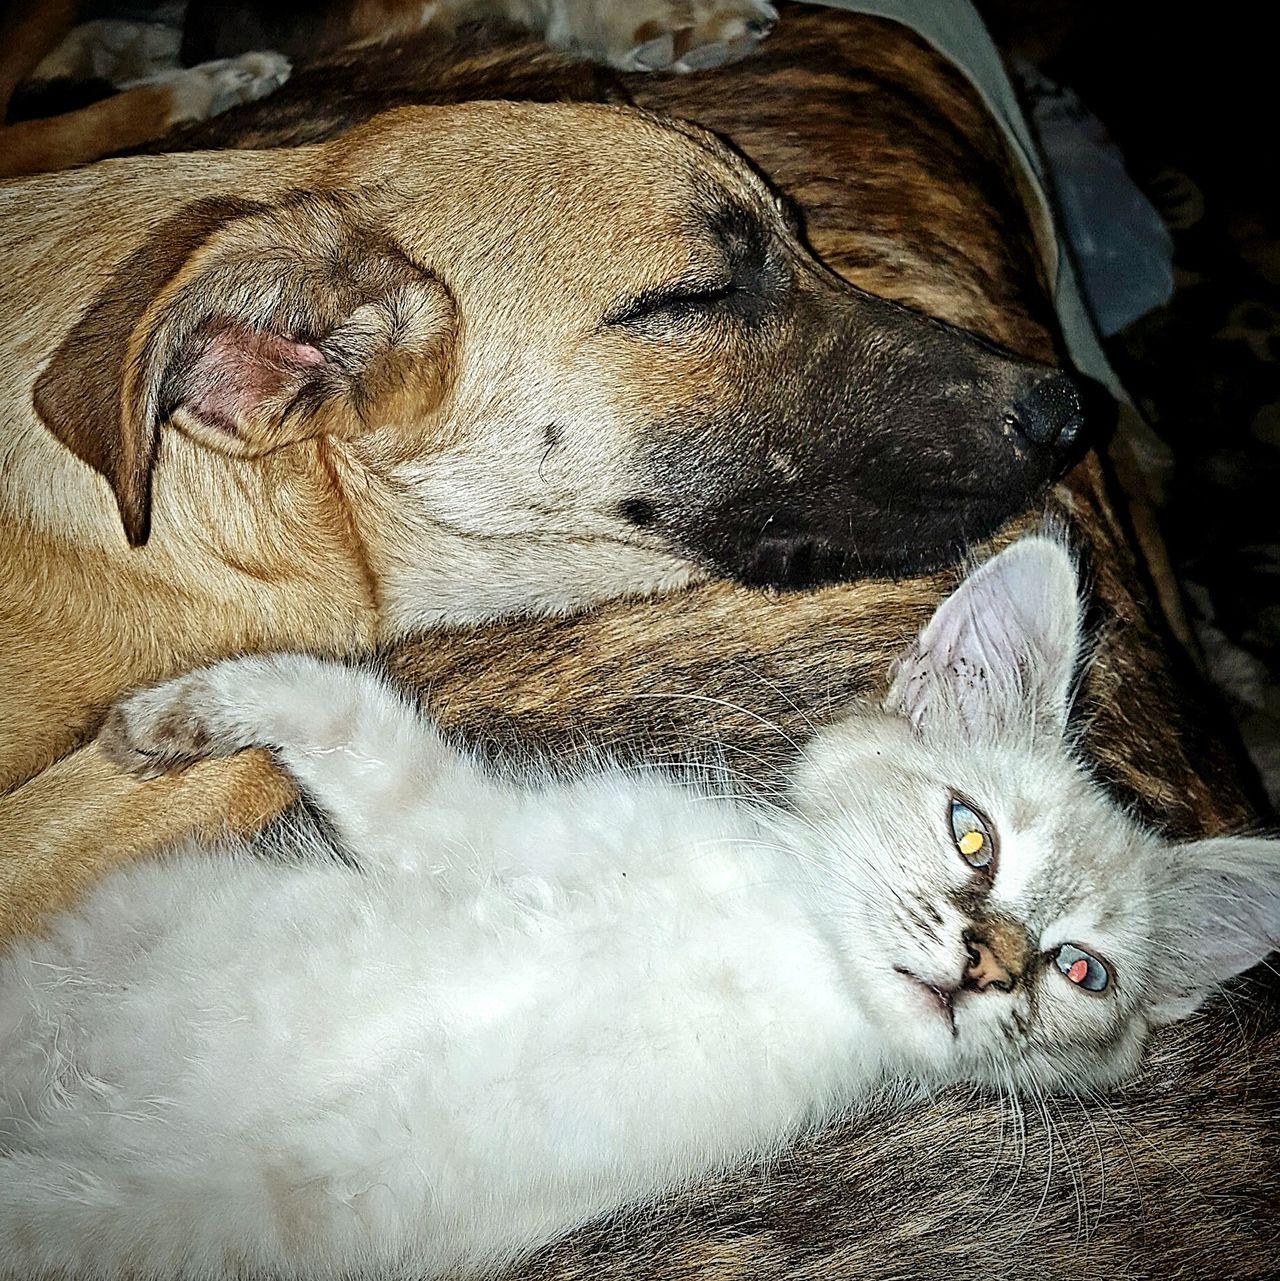 Dog Cat Pets Animals Sleeping Sleepy Friends Nap Dog And Cat Pet Love Pets Sleeping Kitten Puppy Kitty Kitty Cat Doggy